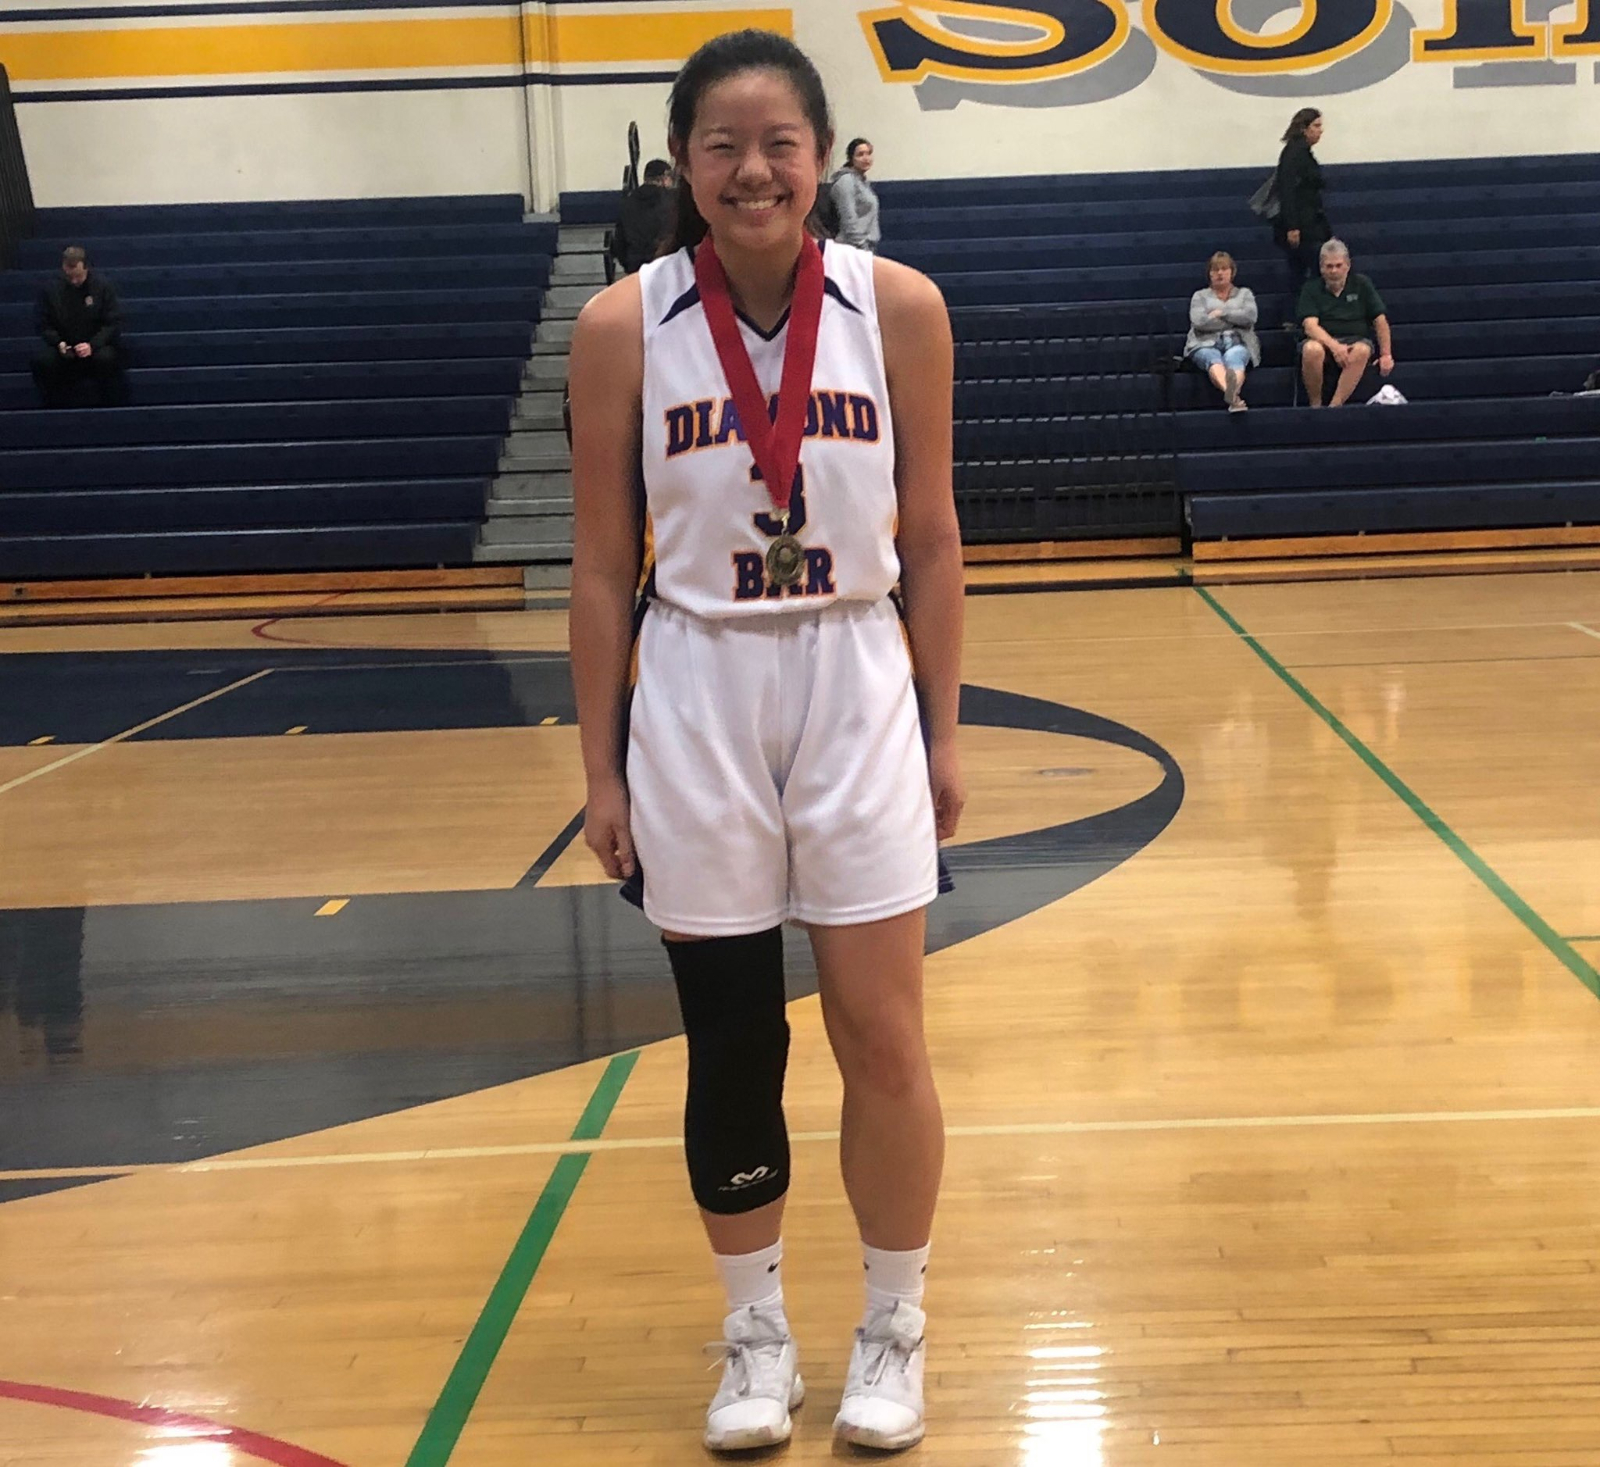 Gizelle Lien Earns All-Tournament Honors